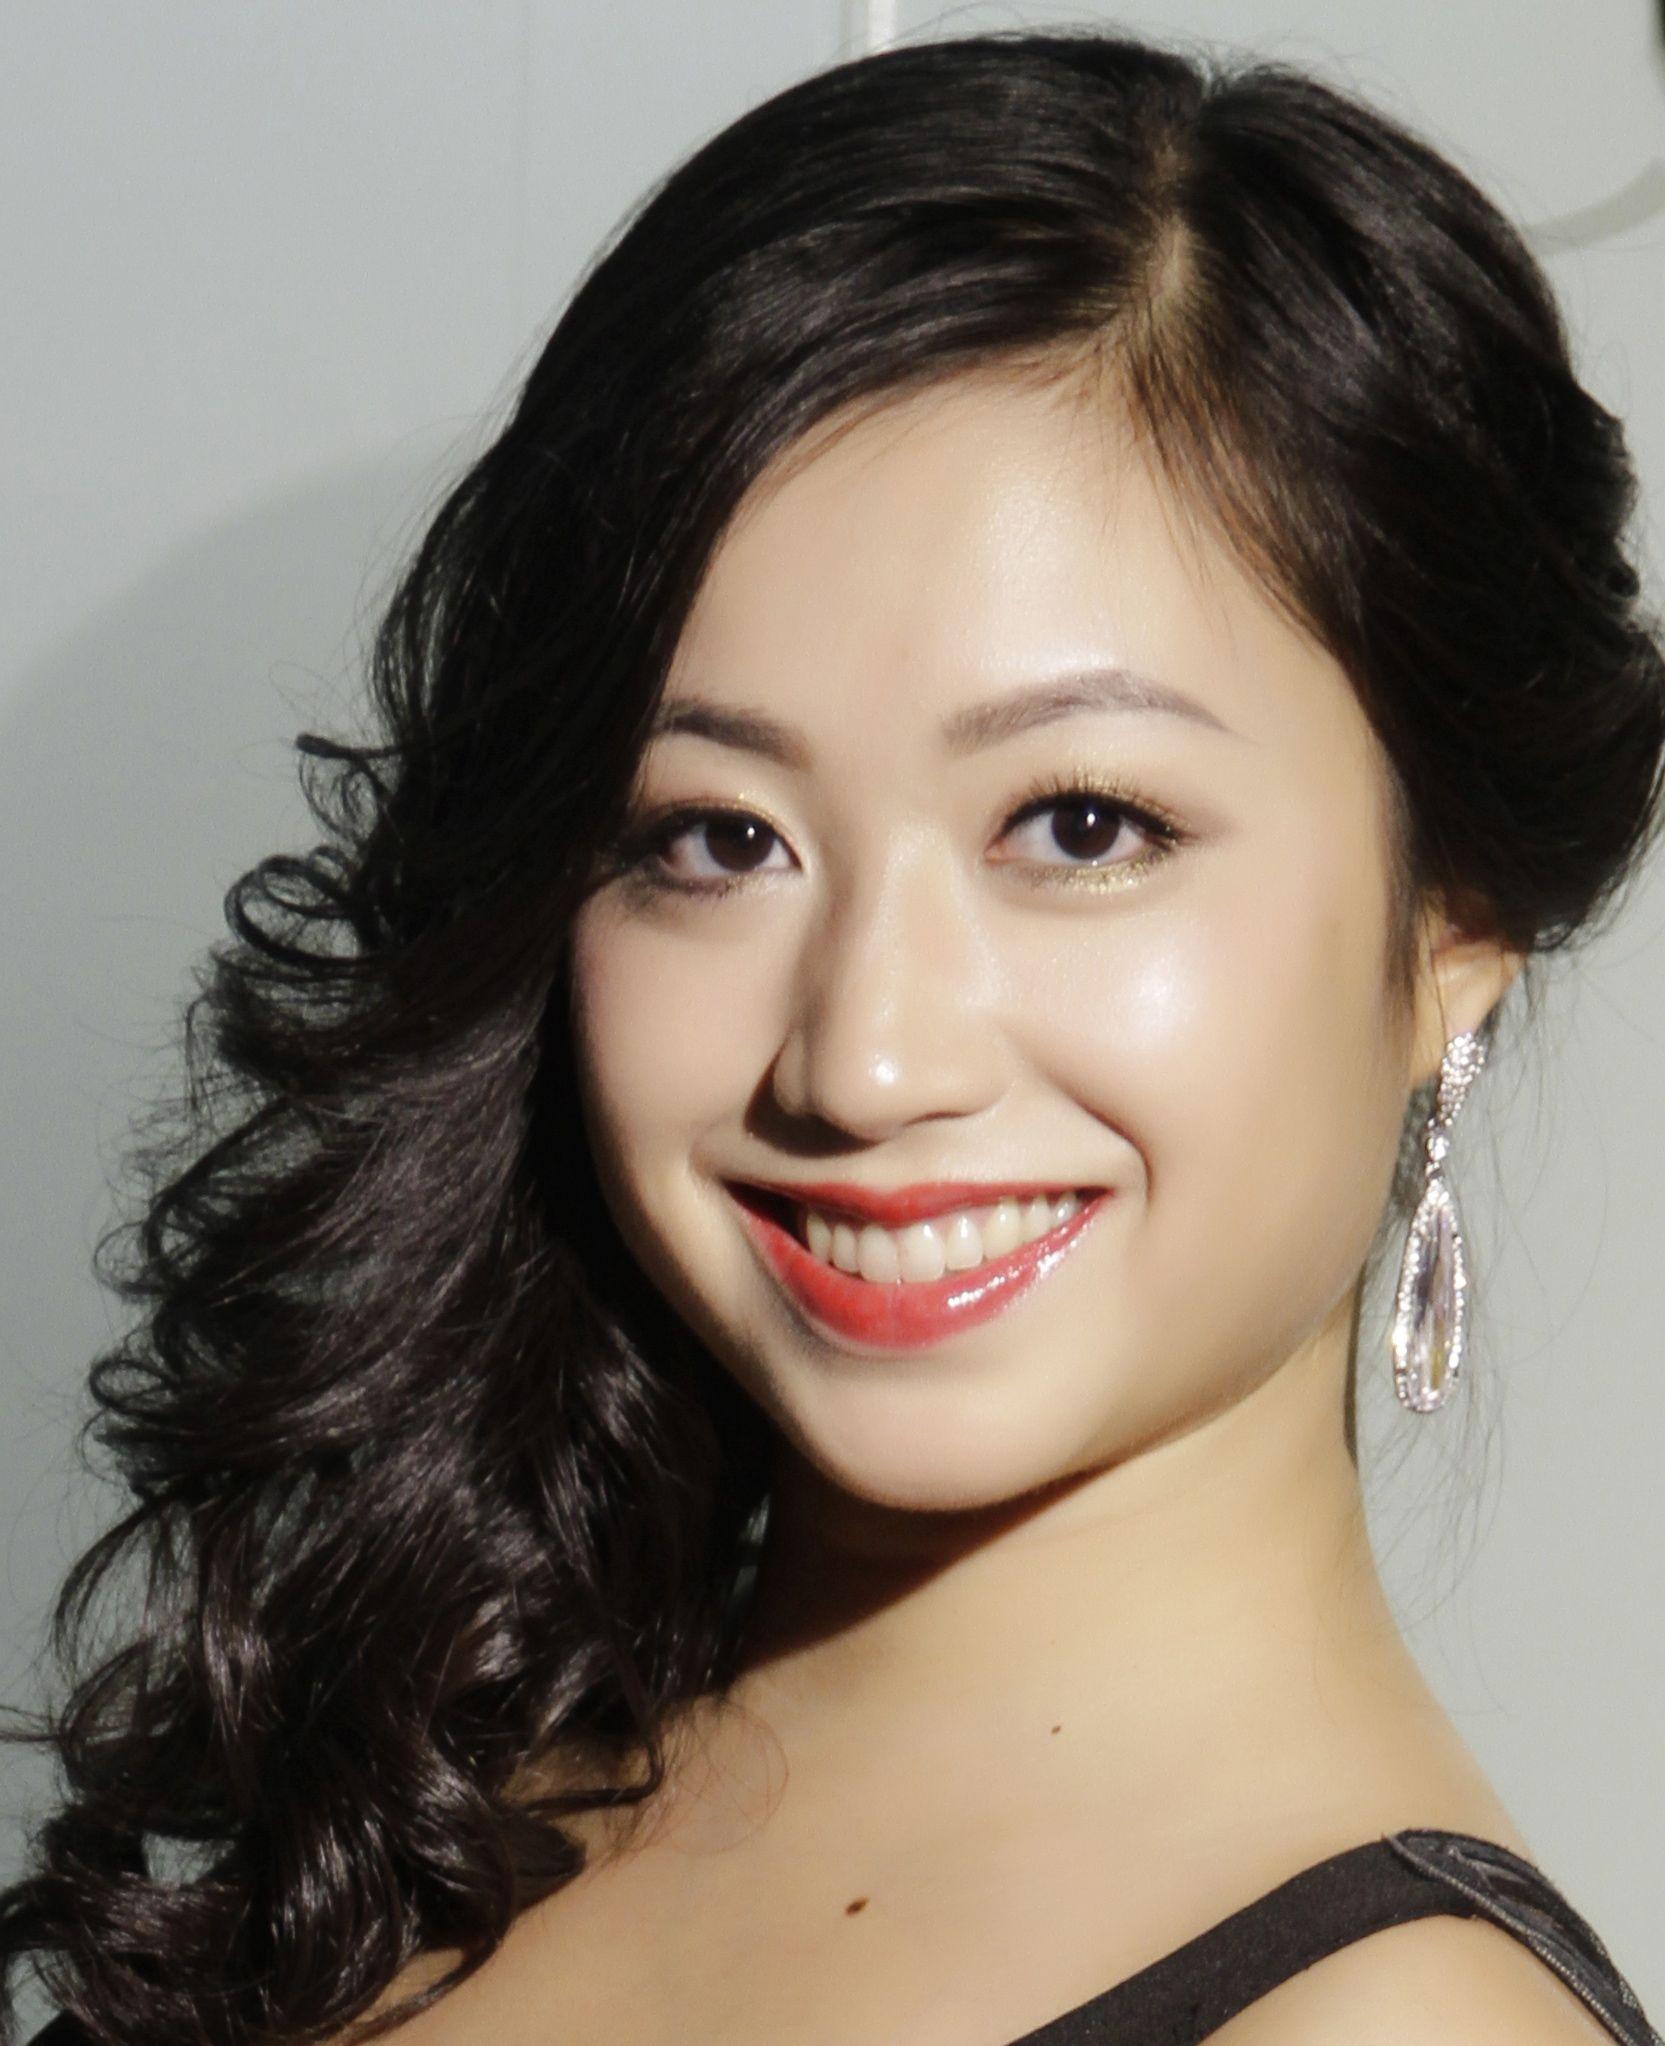 Lisa Wang, cofounder of SheWorx